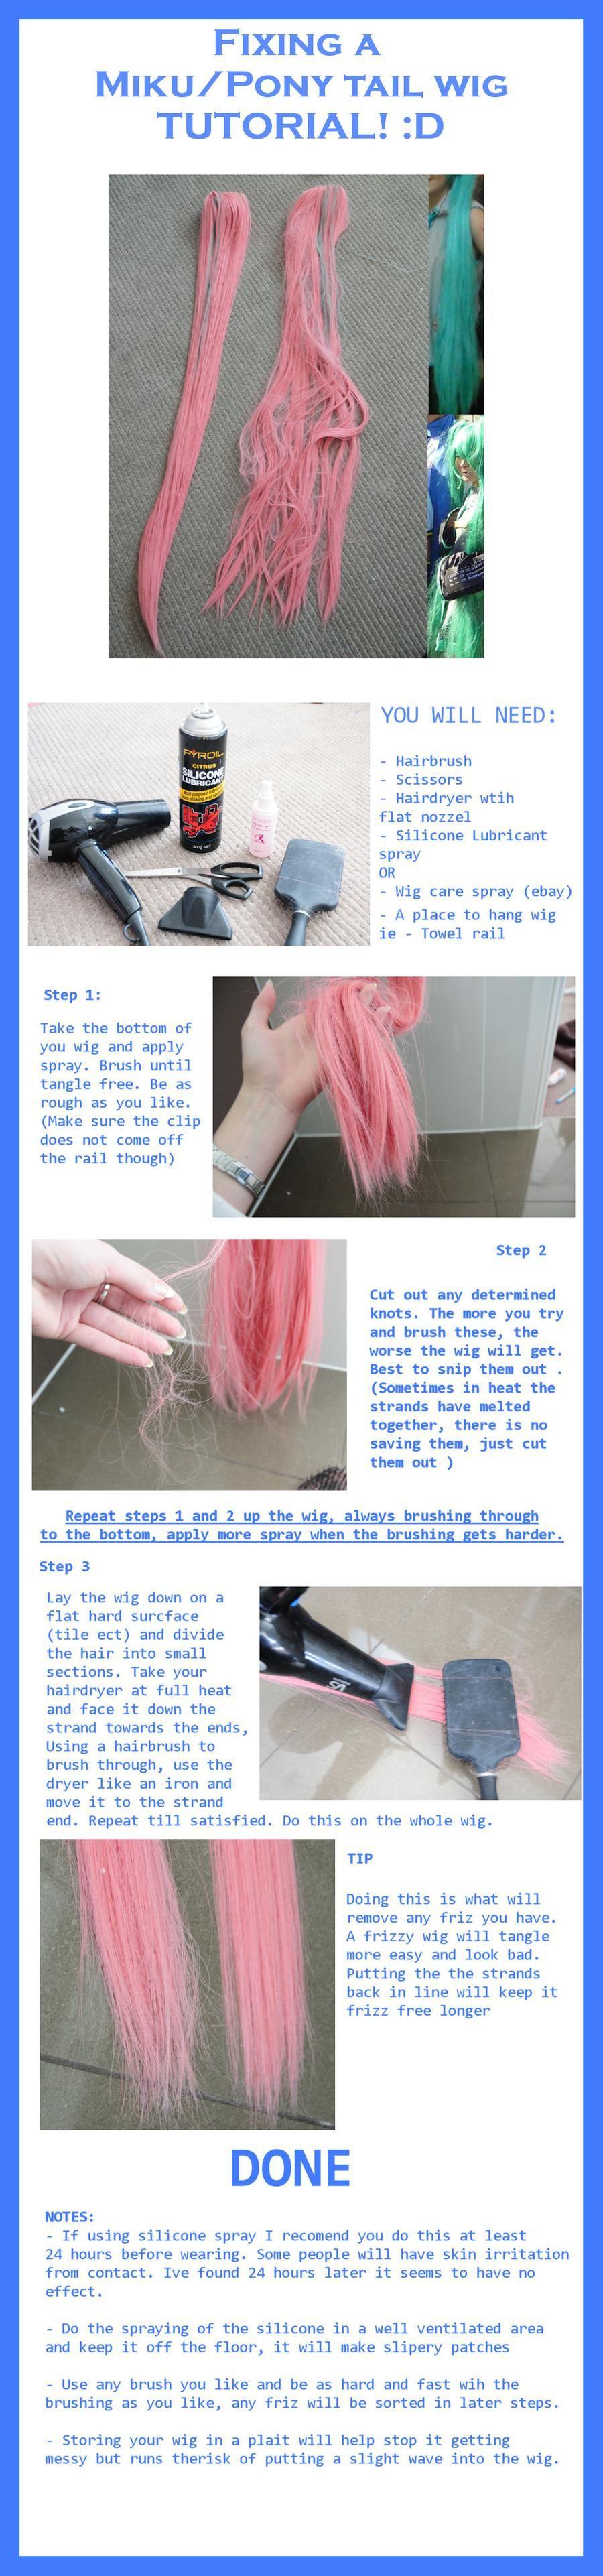 Tutorial Fixing Ponytail wig by LolaInProgress on